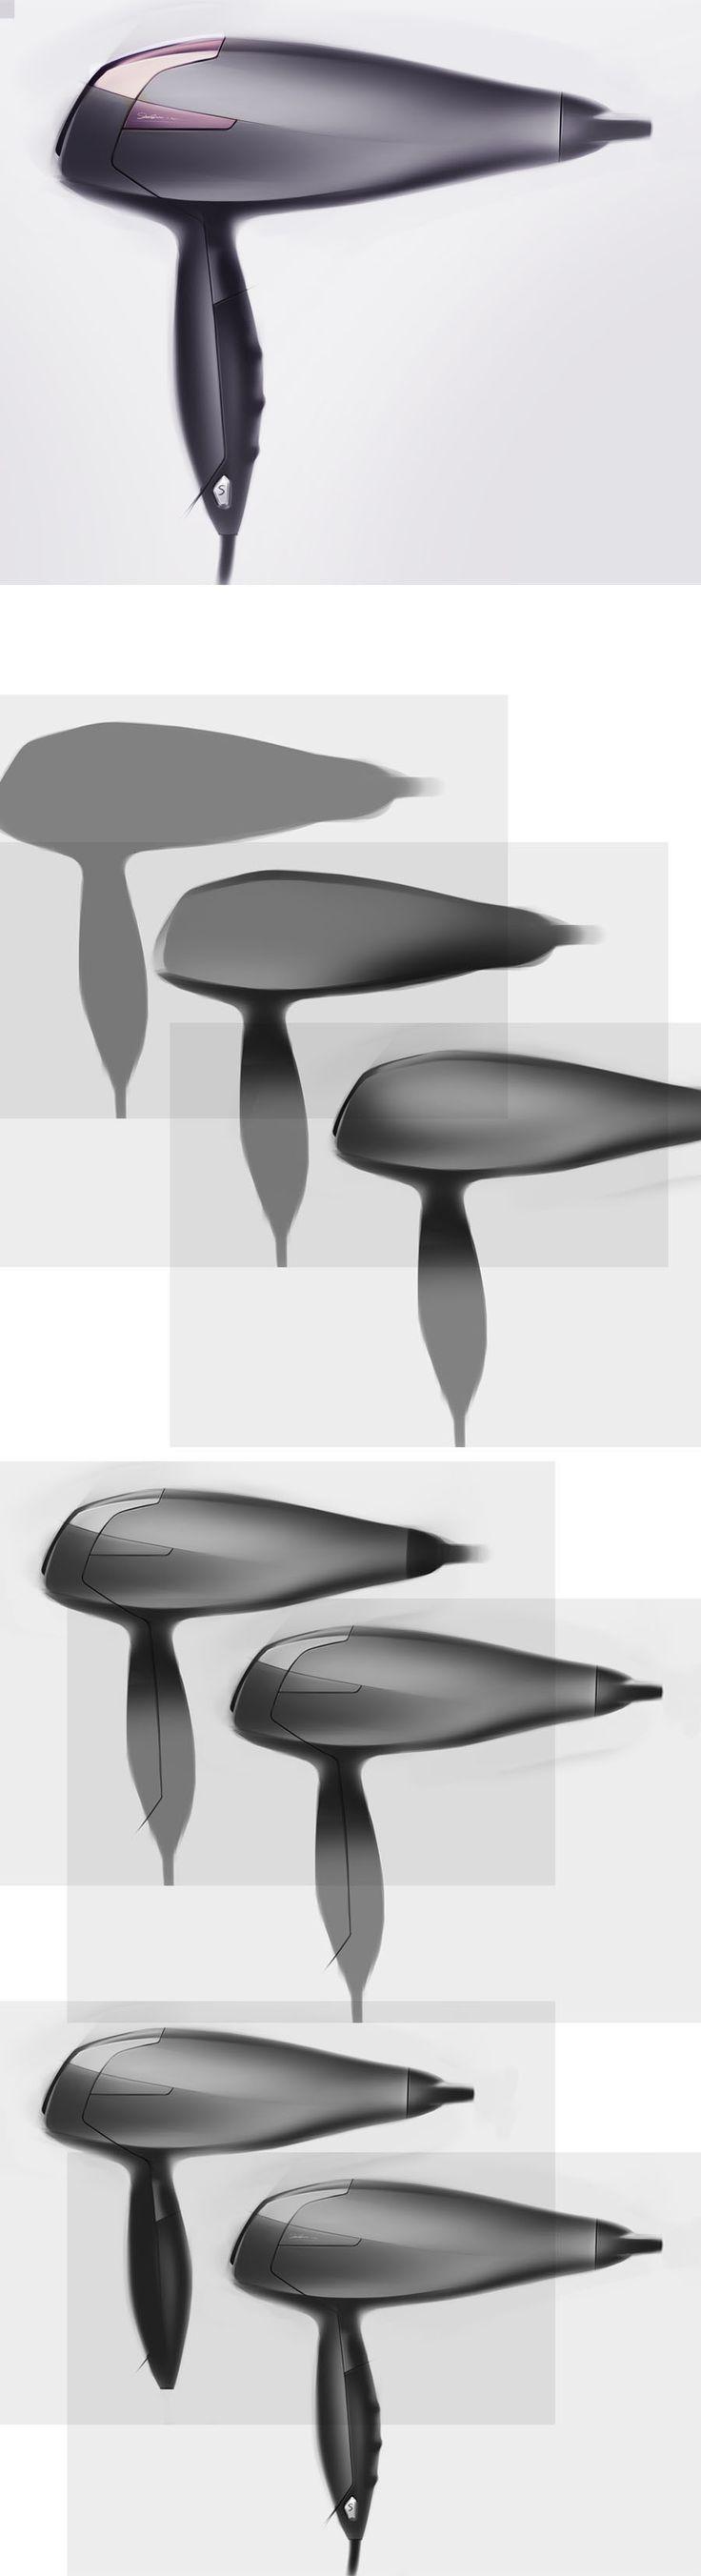 2501 best industrial design images on pinterest | product design